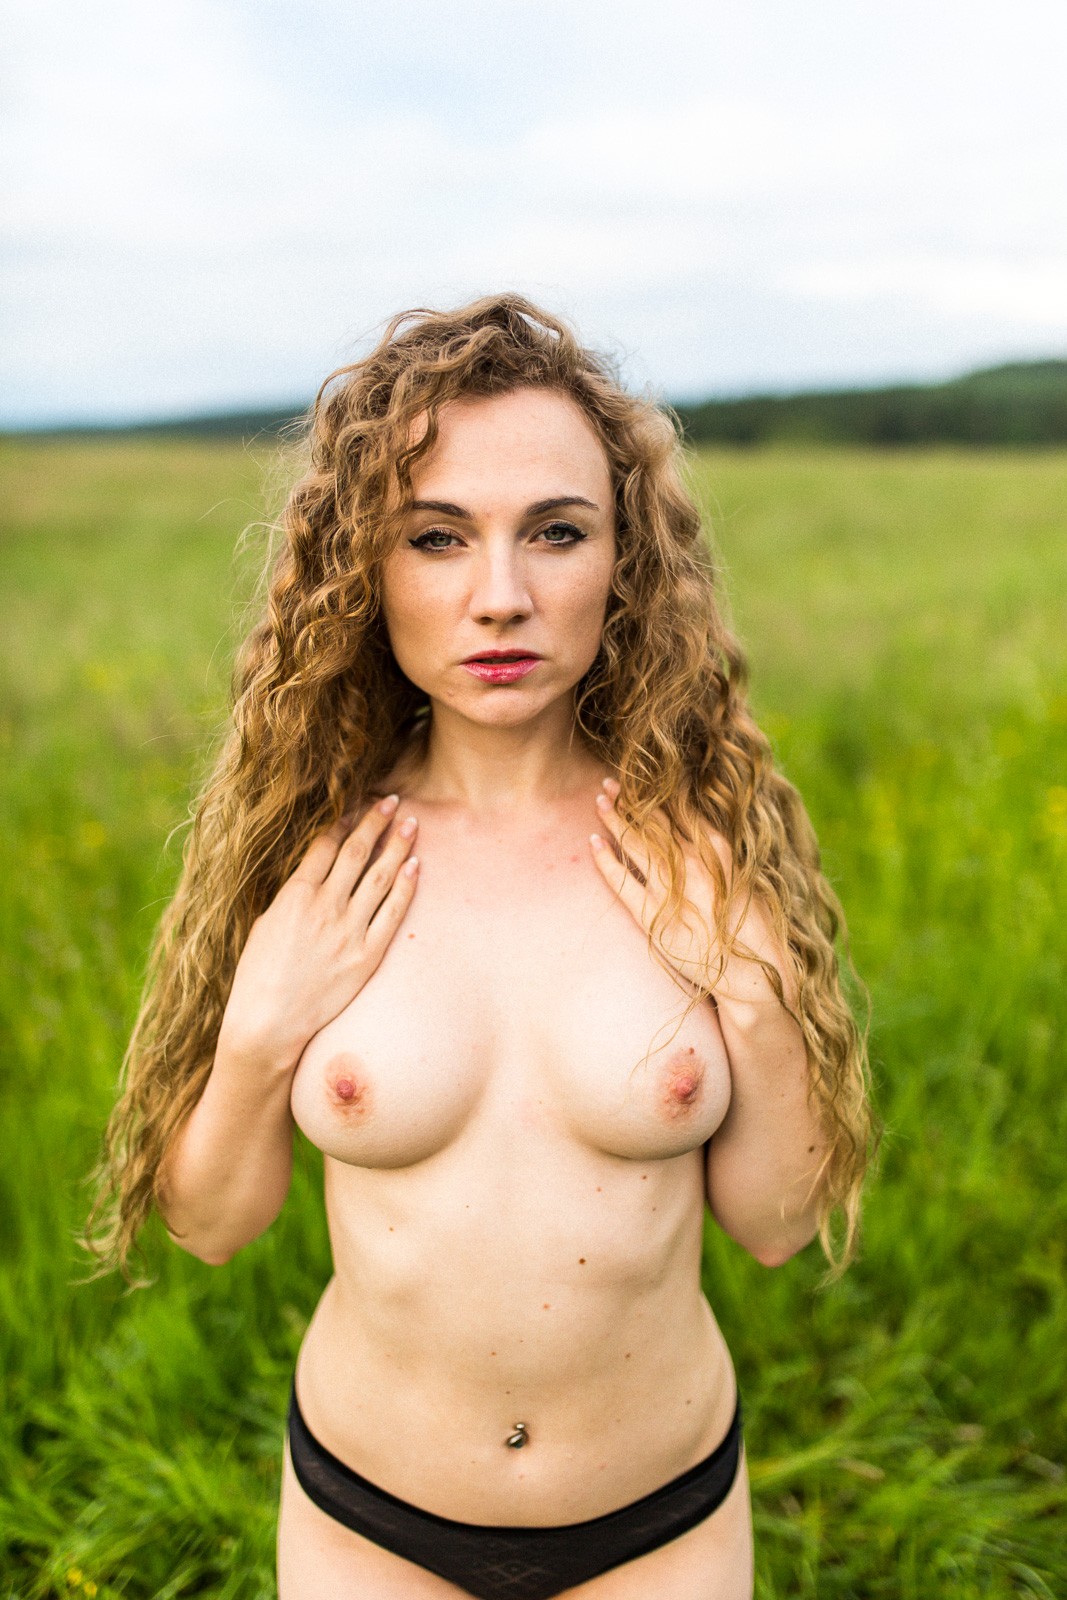 Christin halbnackt in der Natur - Boudoir Christin im Sessel - Akt Erotik Boudoir Fotograf sexy Homeshooting nackt